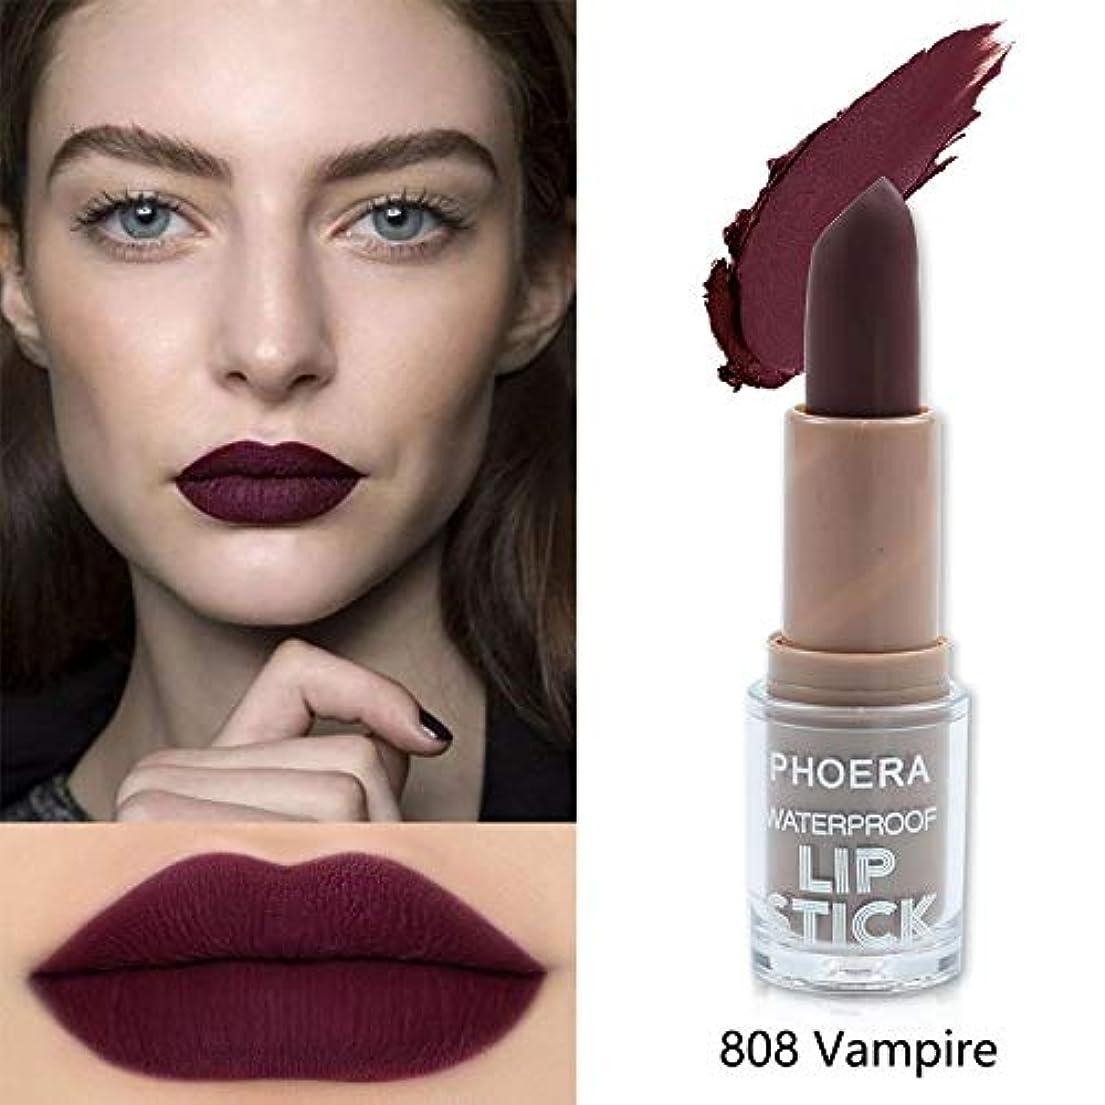 移動検索エンジン最適化秘書Beauty Matte Moisturizing Lipstick Makeup Lipsticks Lip Stick Waterproof Lipgloss Mate Lipsticks Cosmetic